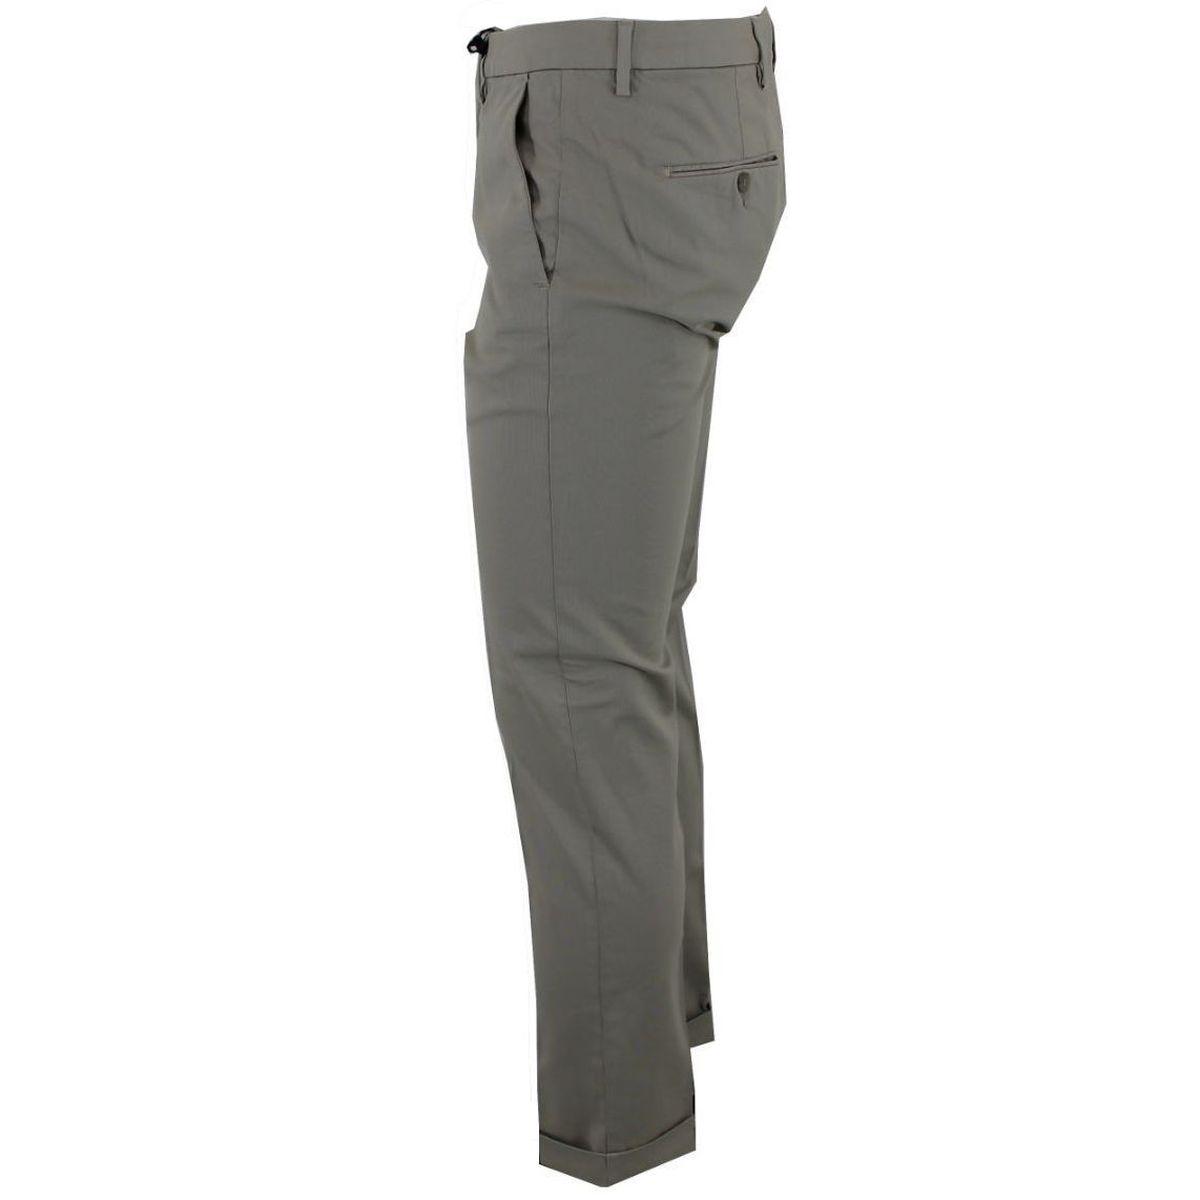 Pantalone chino Beige Seventy